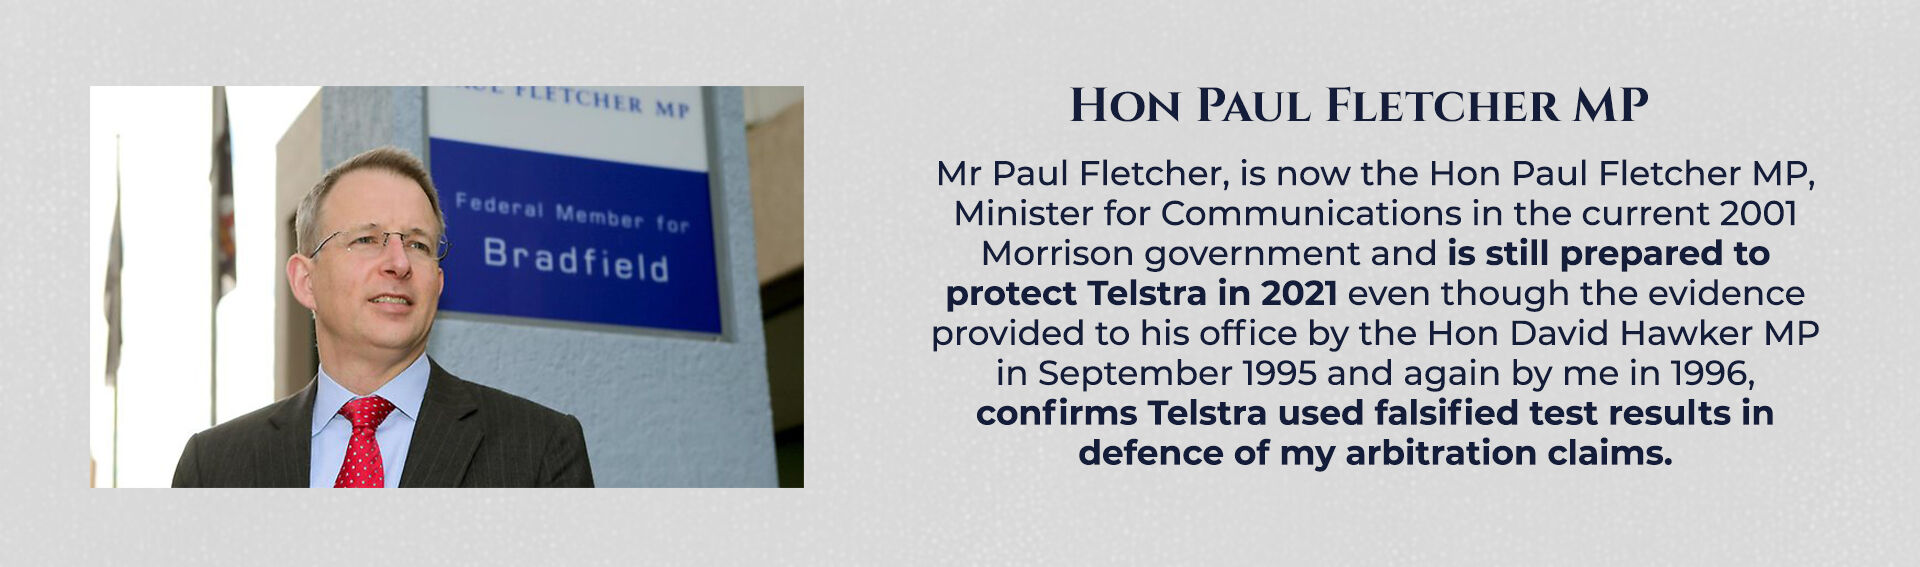 Absent Justice - Hon Paul Fletcher MP